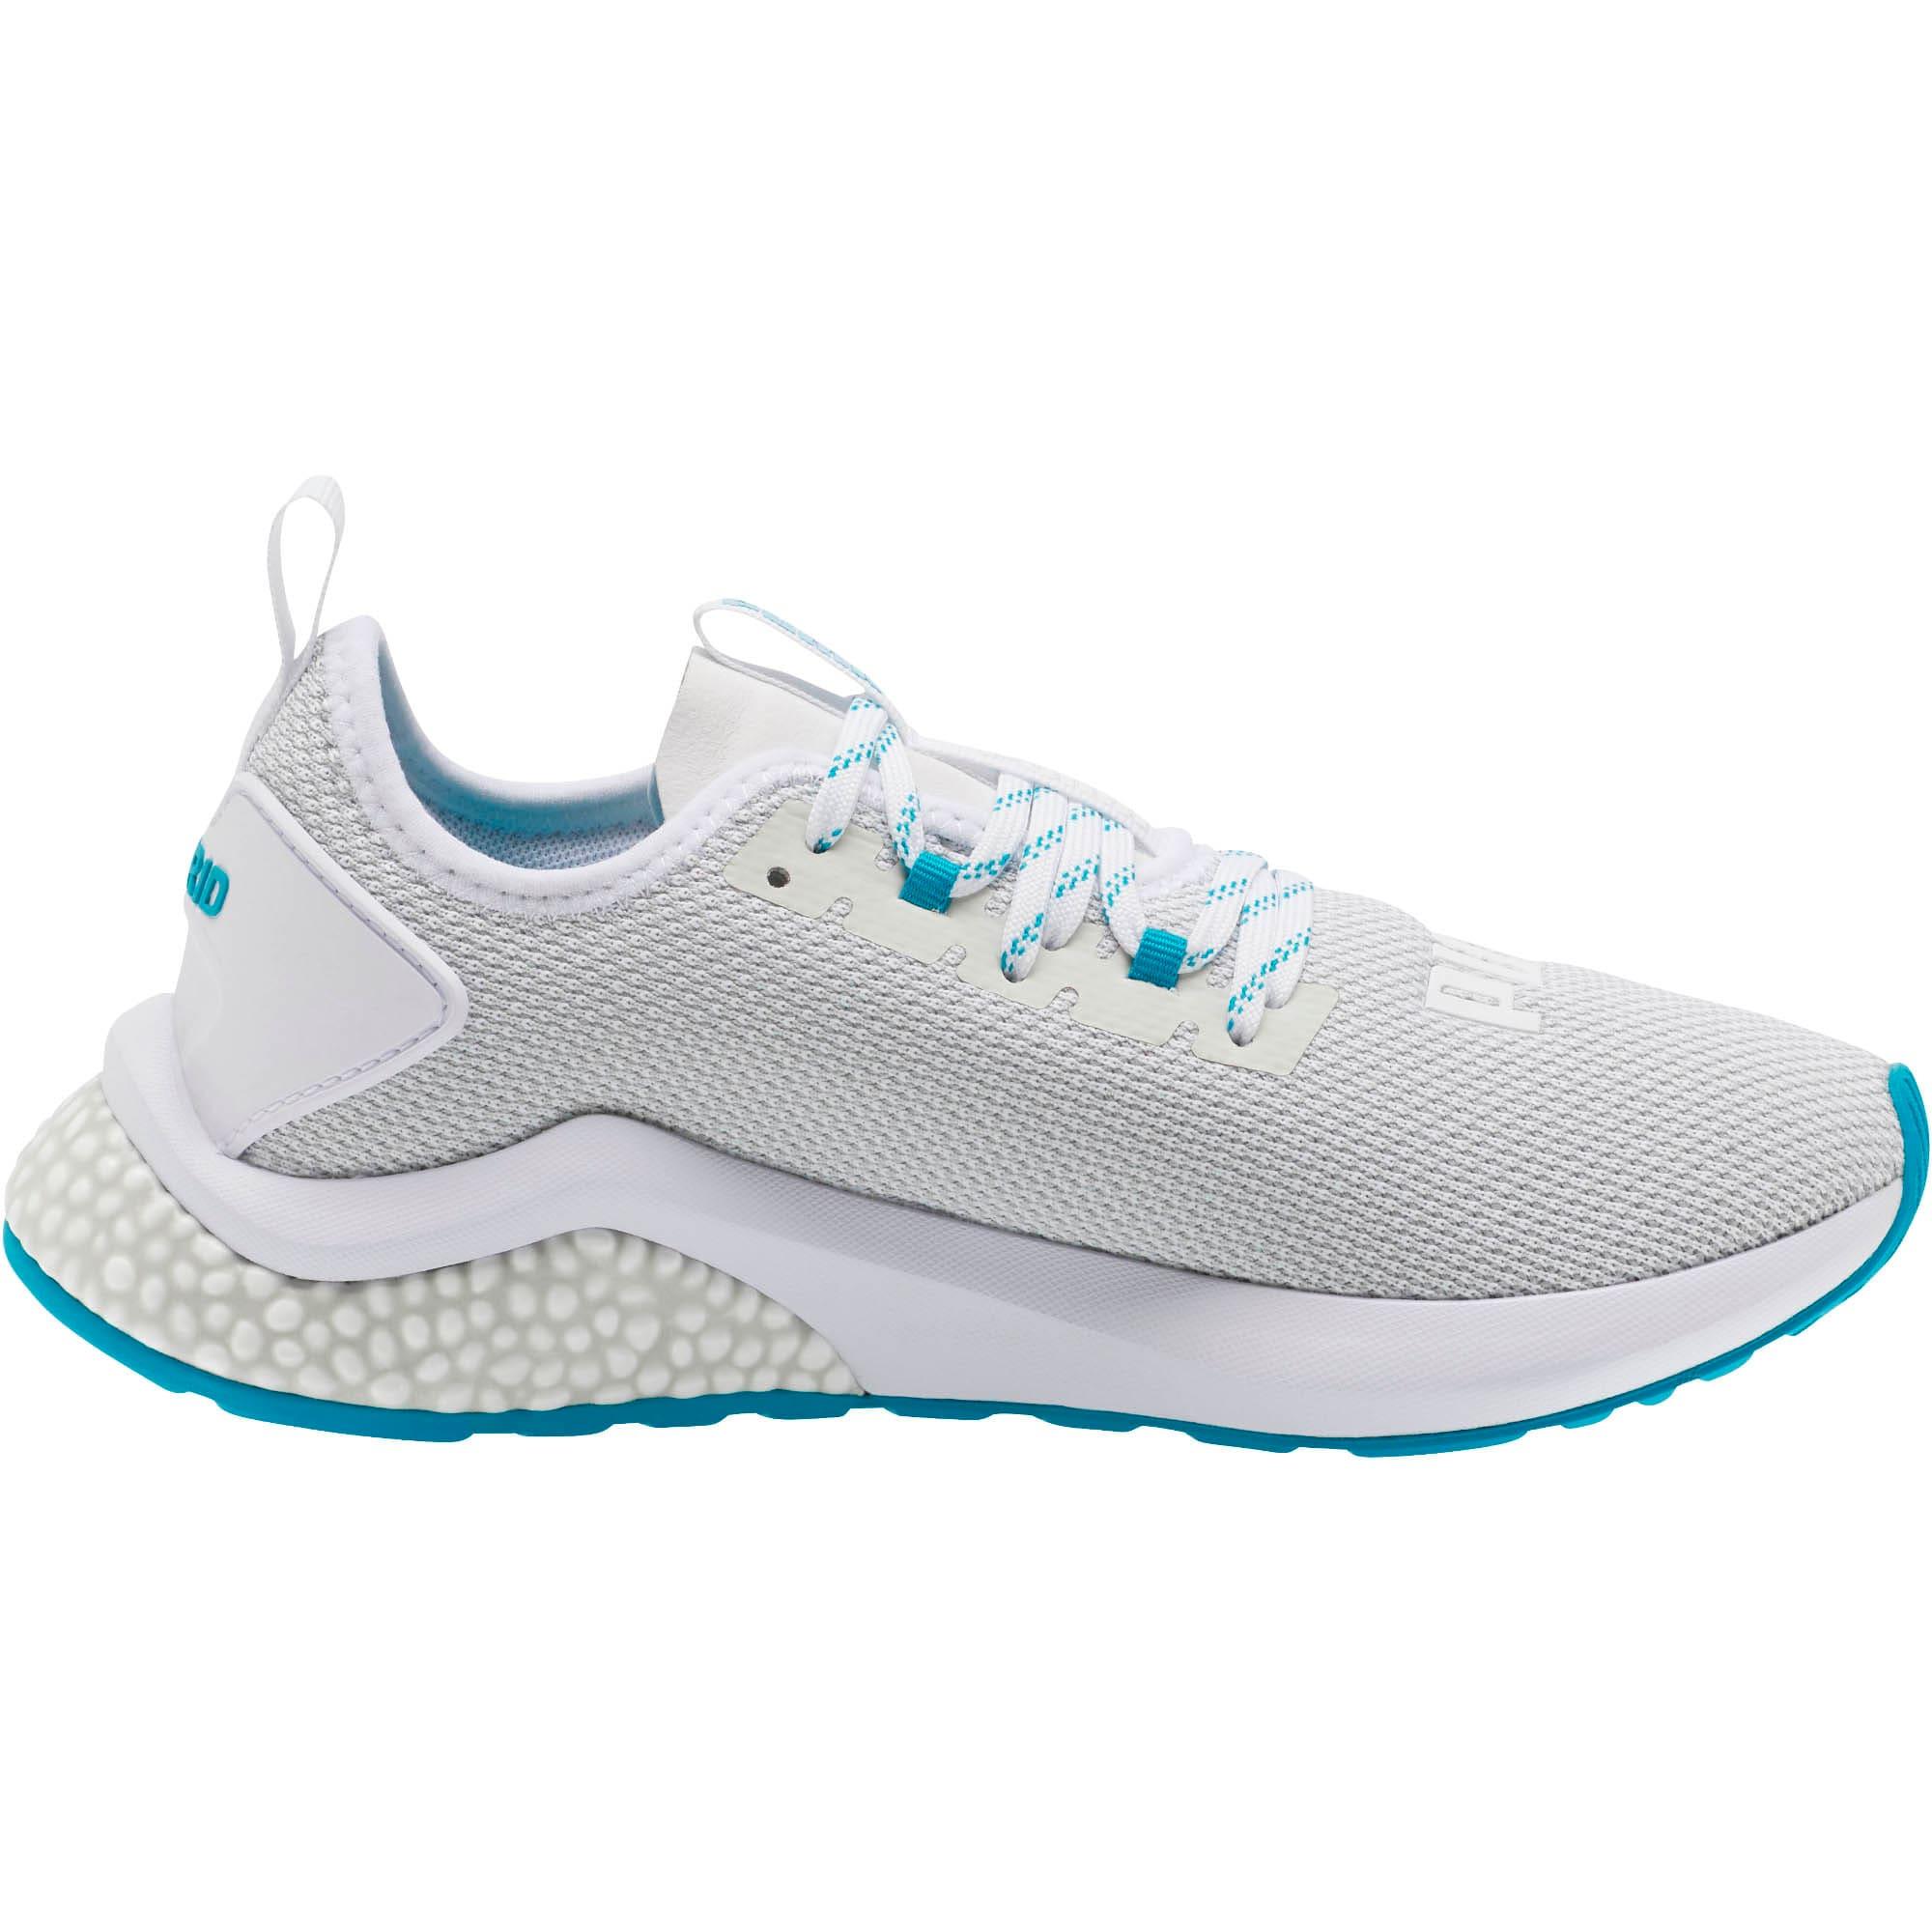 Thumbnail 4 of HYBRID NX Women's Running Shoes, Puma White-Caribbean Sea, medium